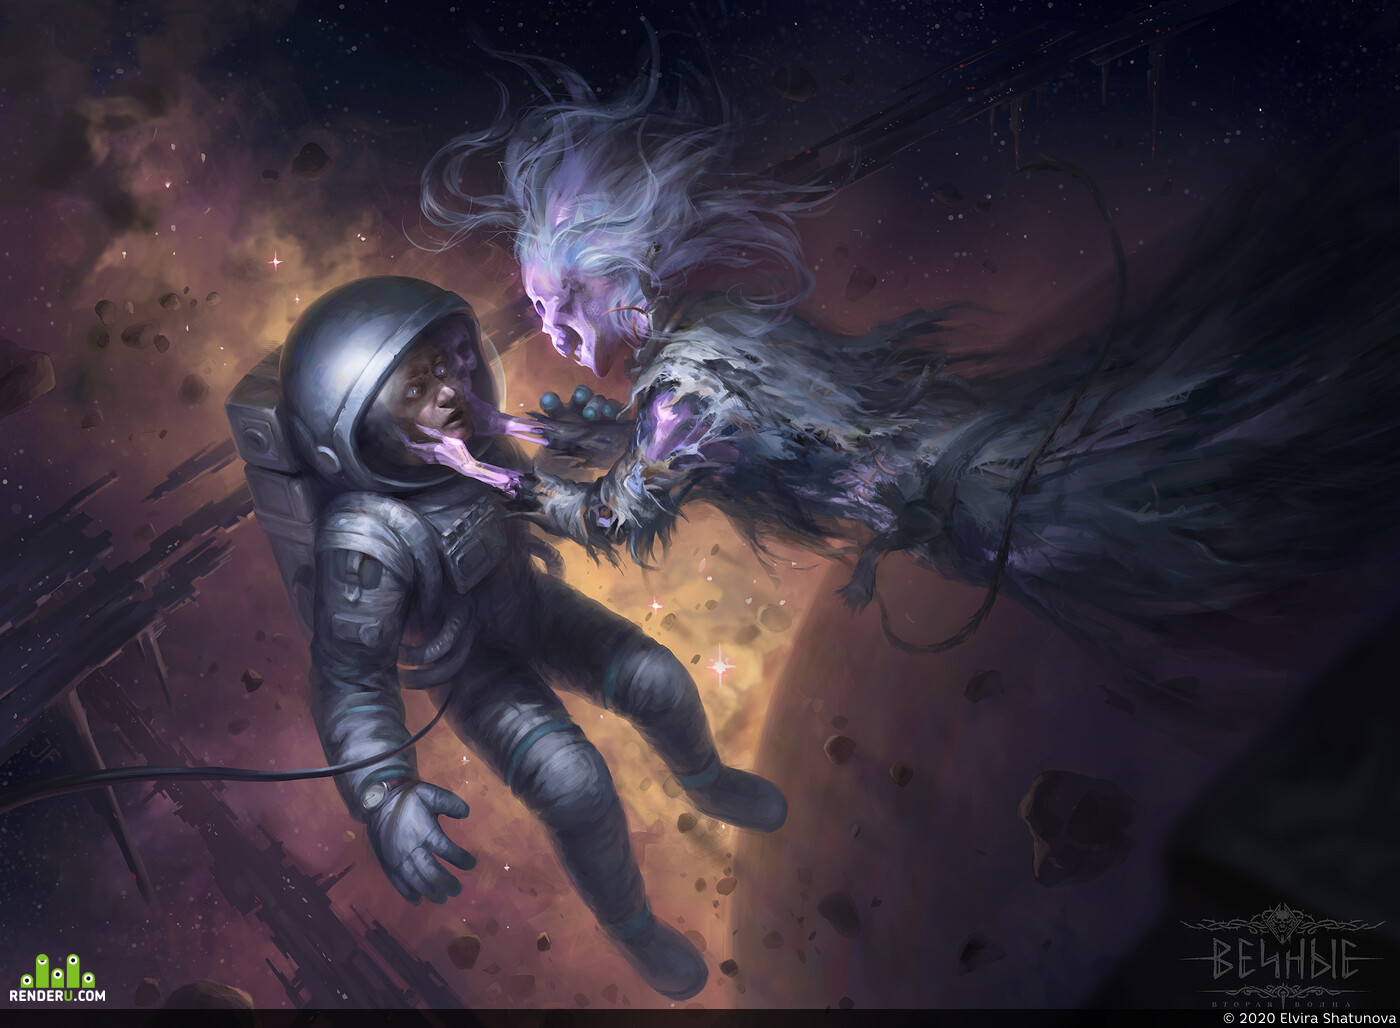 Eternal, Ghost, astronaut, Space, Horror, cosmonaut, planet, stars